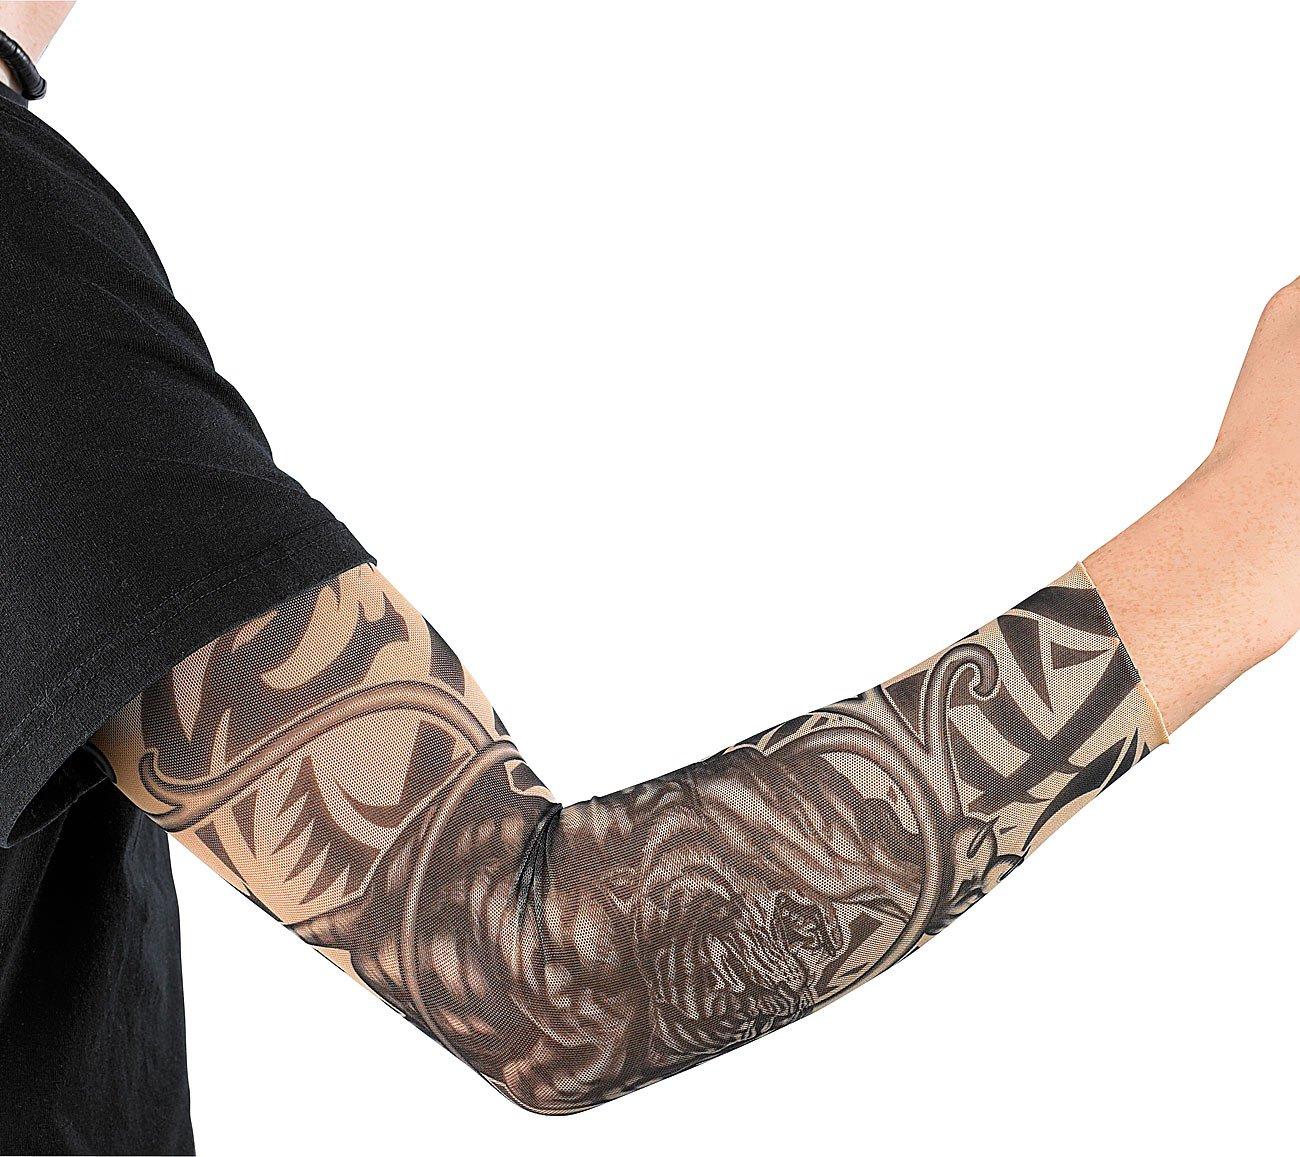 Tribal Tattoo Ärmlinge Ärmel Tattooärmel Armlinge Strumpf Tattoos Arm Armstrumpf Accessoires